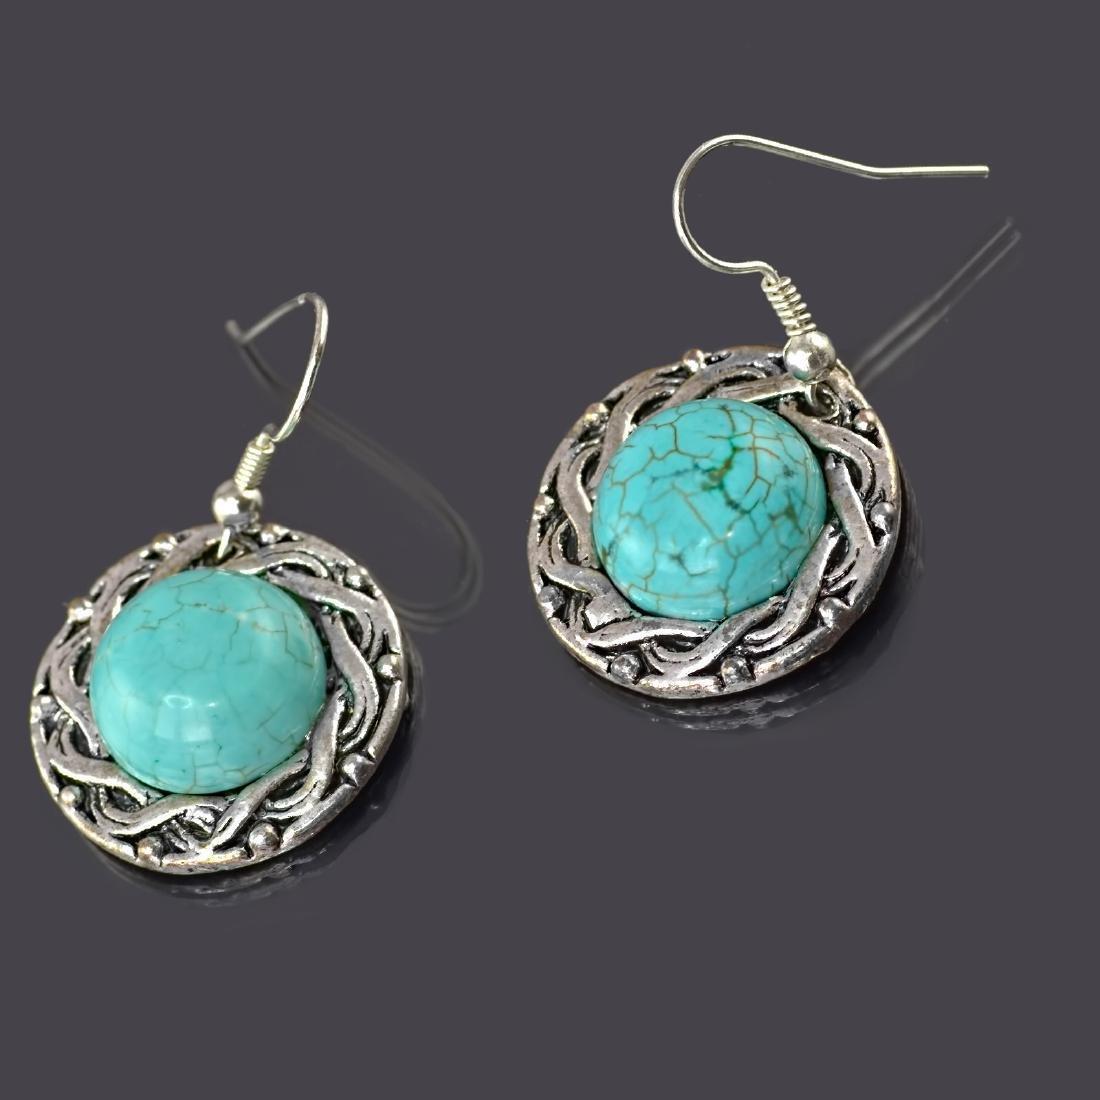 Ethnic Style Turquoise Howlite Earrings - 3